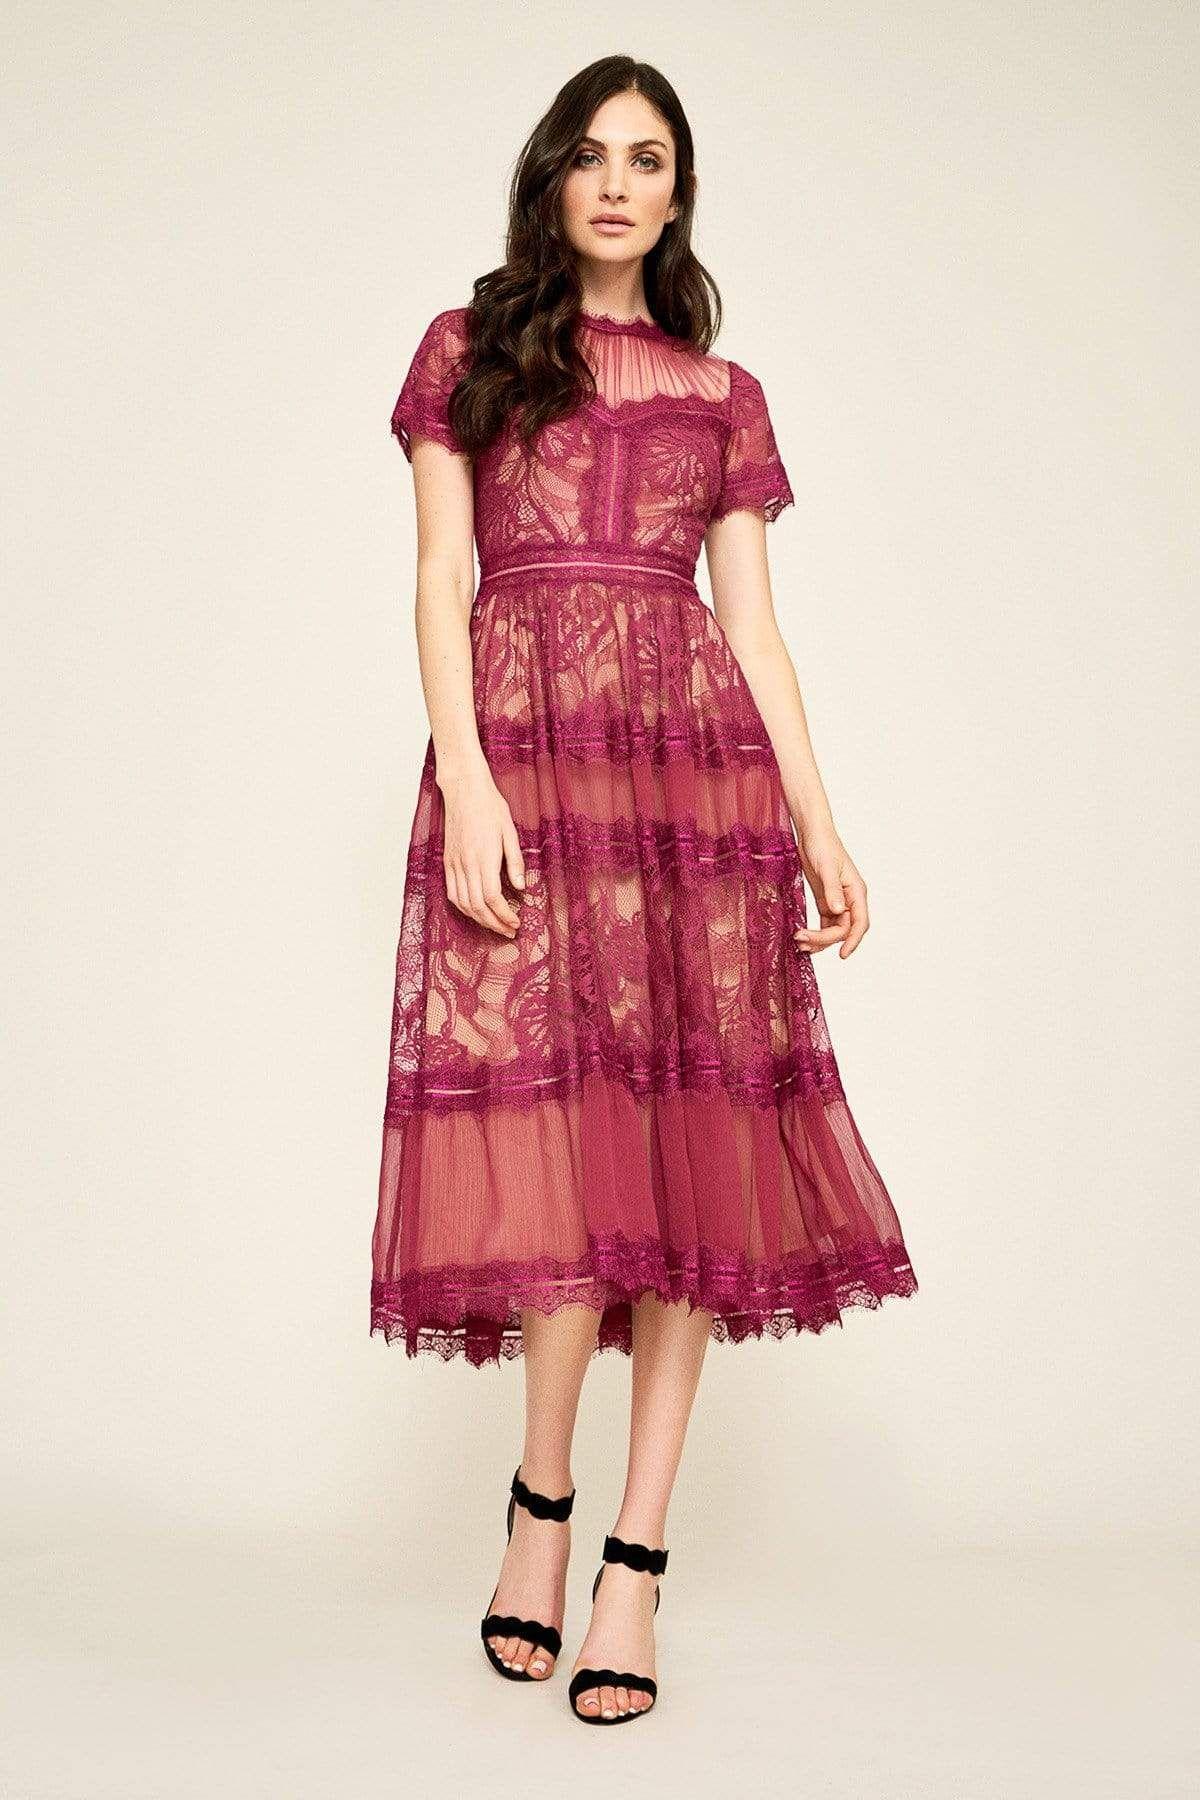 Tadashi Shoji Lace Shirred Jewel Tea Length Dress Tea Length Dresses Calf Length Dress Dresses [ 1800 x 1200 Pixel ]